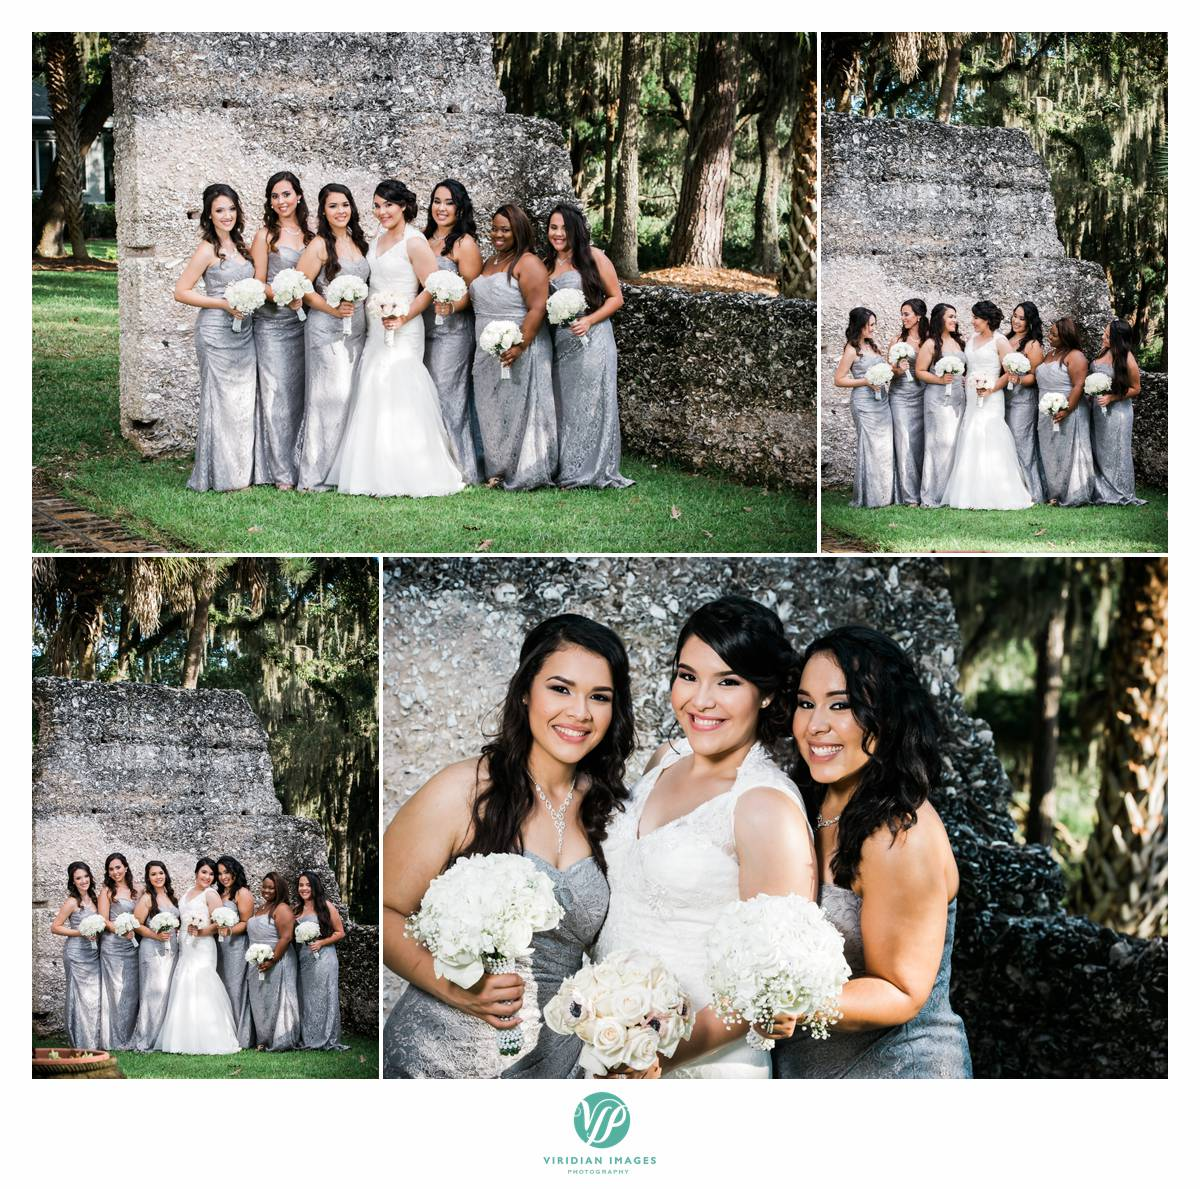 Hilton-Head-Callawassie-Club-Wedding-Viridian-Images-Photography-photo 22